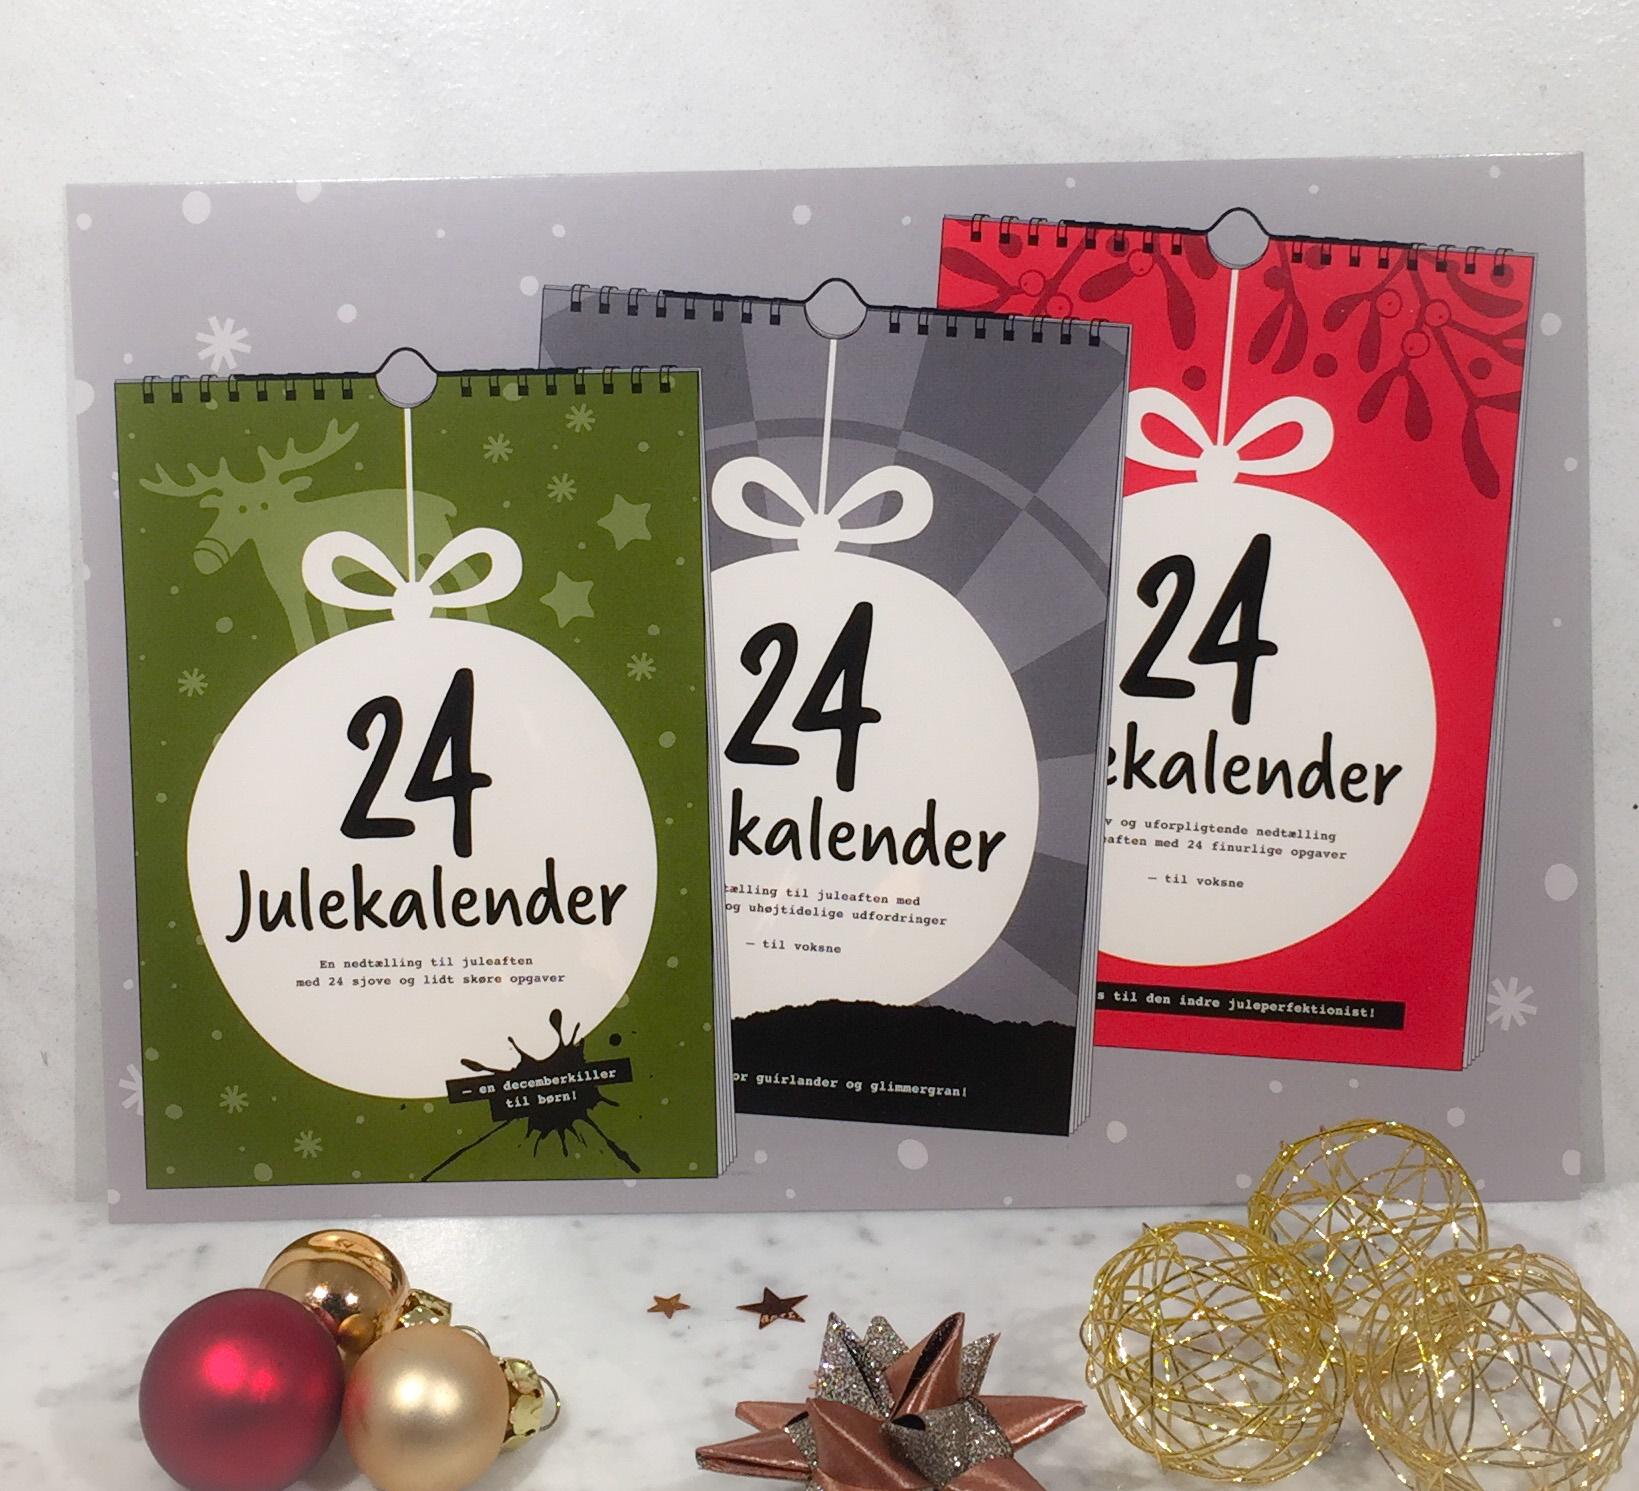 Julekalender, Julekalender 2017, 24Julekalender, 24 Julekalender,